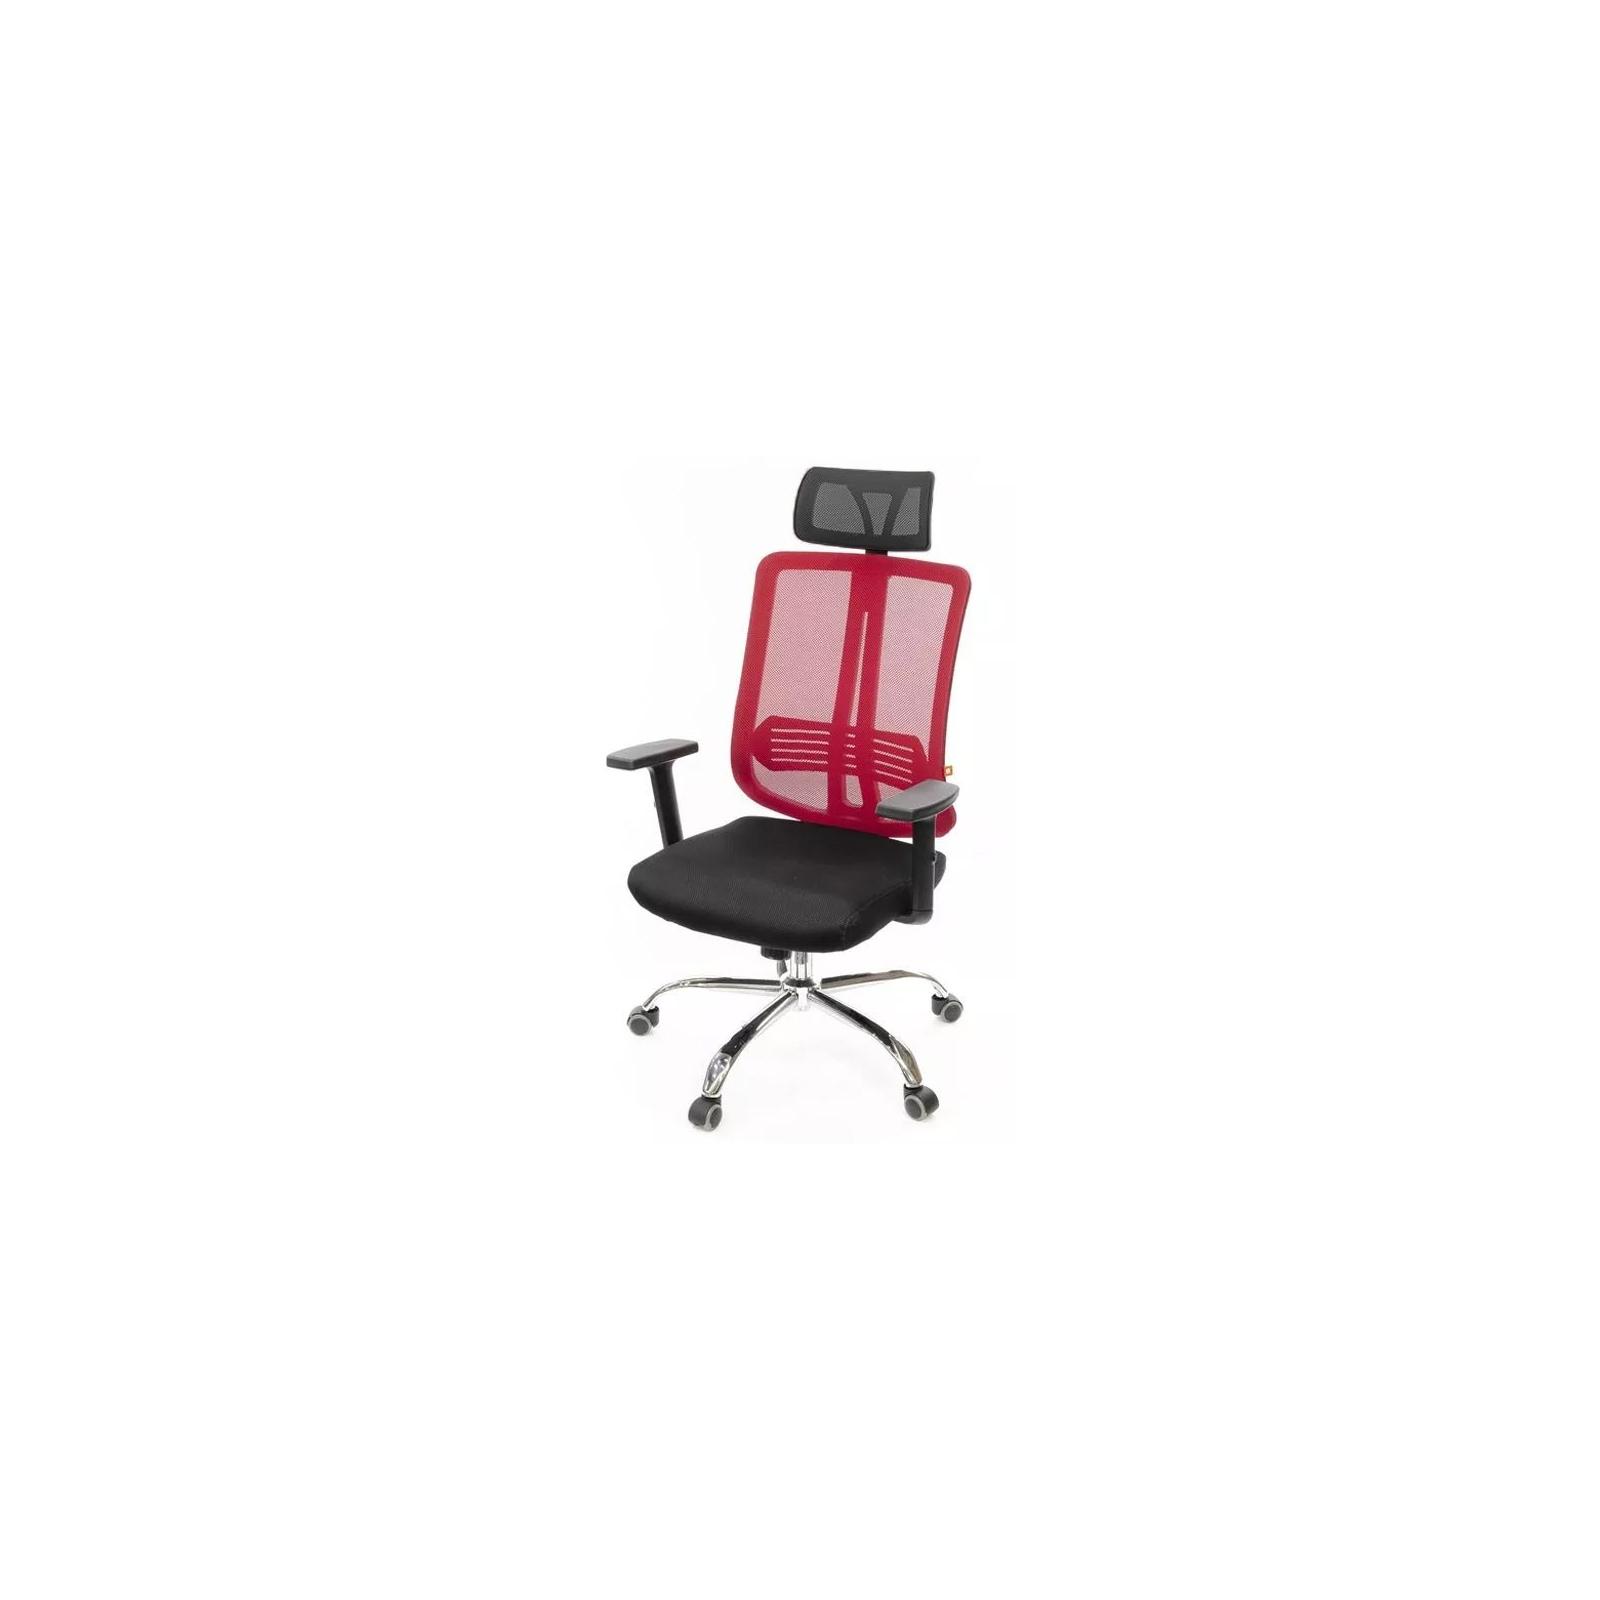 Офисное кресло Аклас Сити CH ANF Красное (15991)